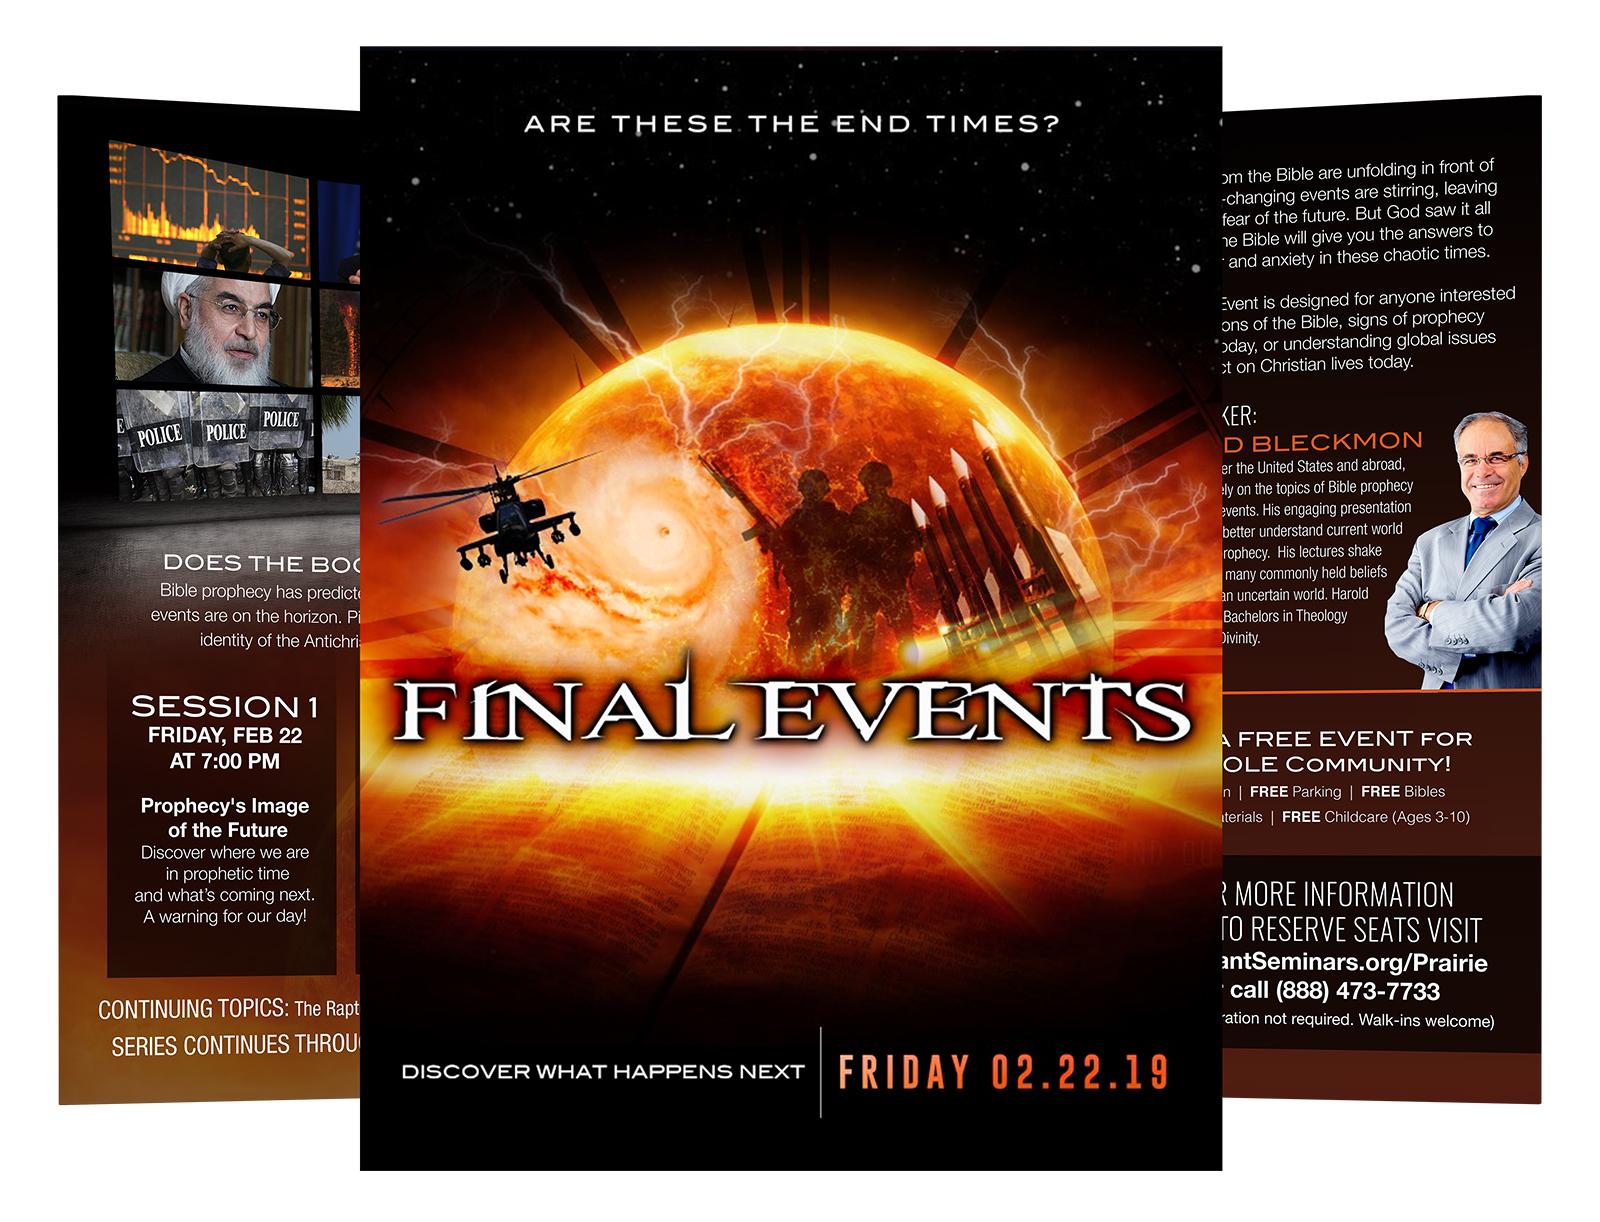 Final Events | SermonView Evangelism Marketing